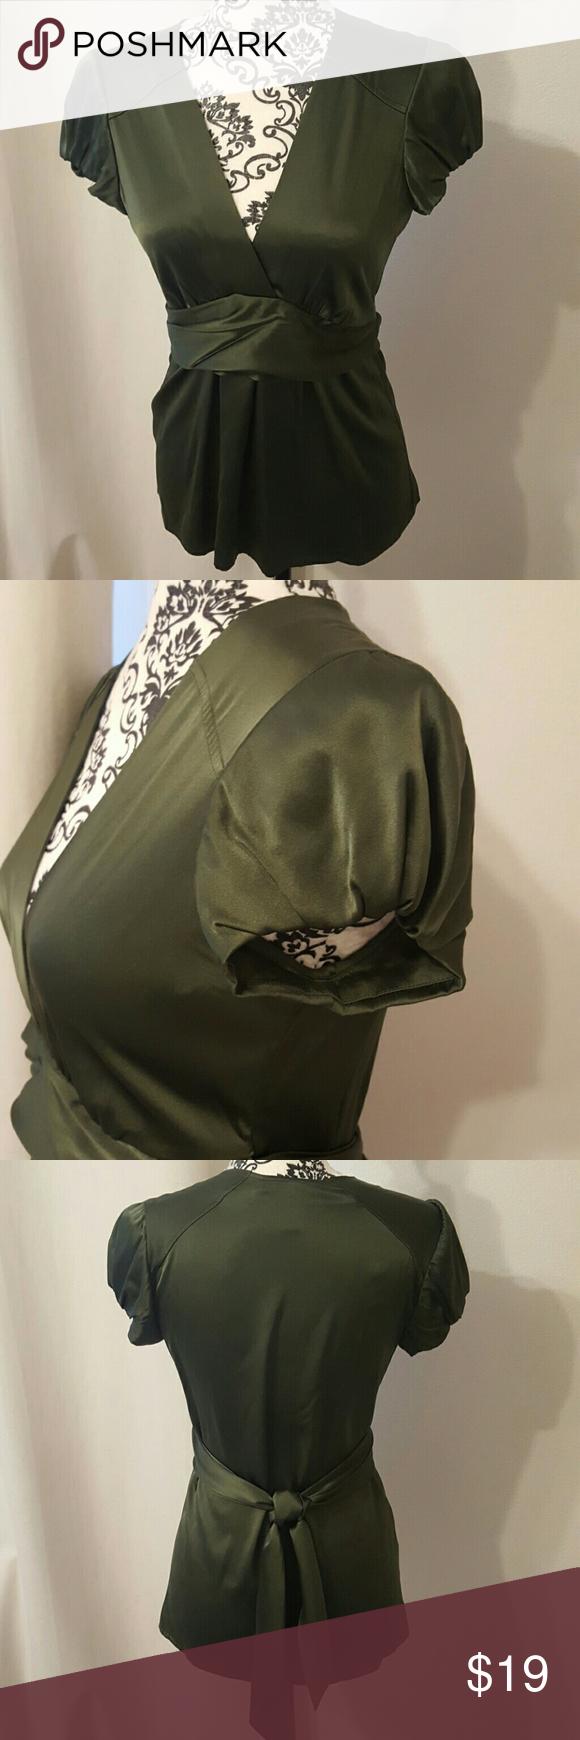 BCBG Silk blouse 93% silk. 7% spandex. Ties in the back. BCBGMaxAzria Tops Blouses